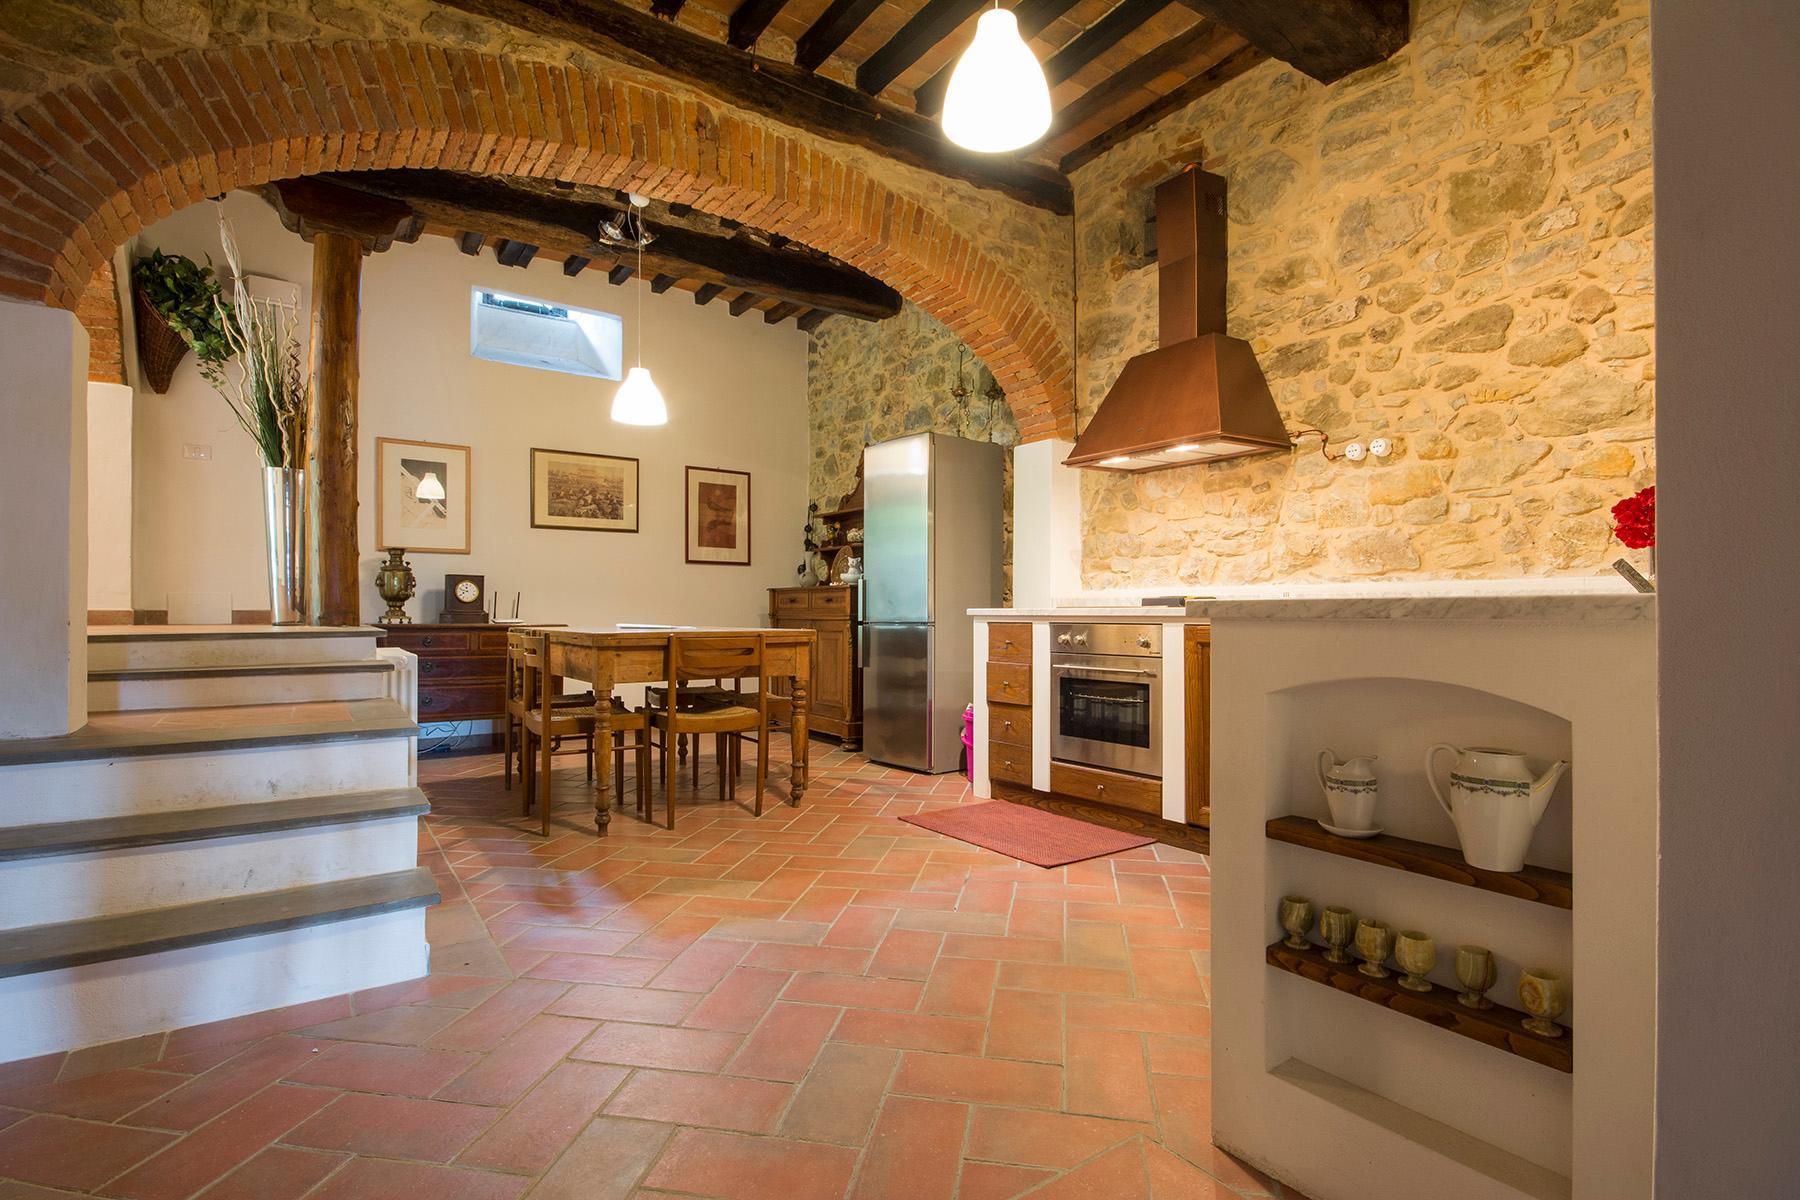 Villa charmante dans dans la Val di Sieve - 12